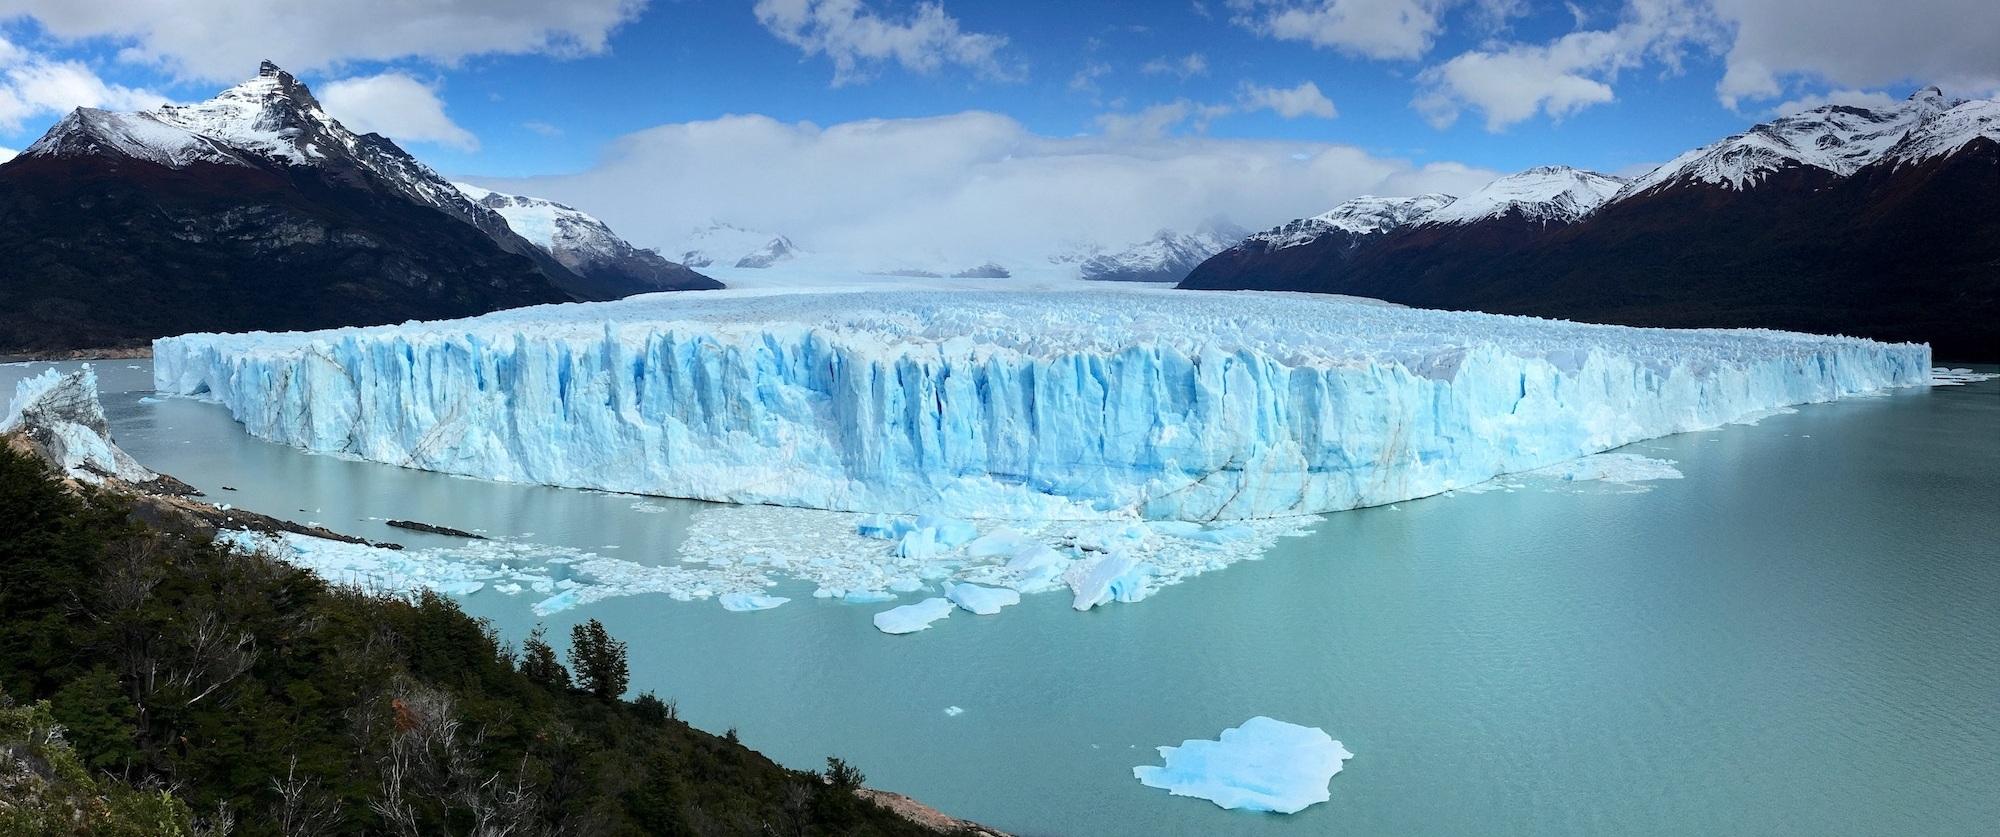 Perito Moreno Glacier - el calafatehiking | kayaking